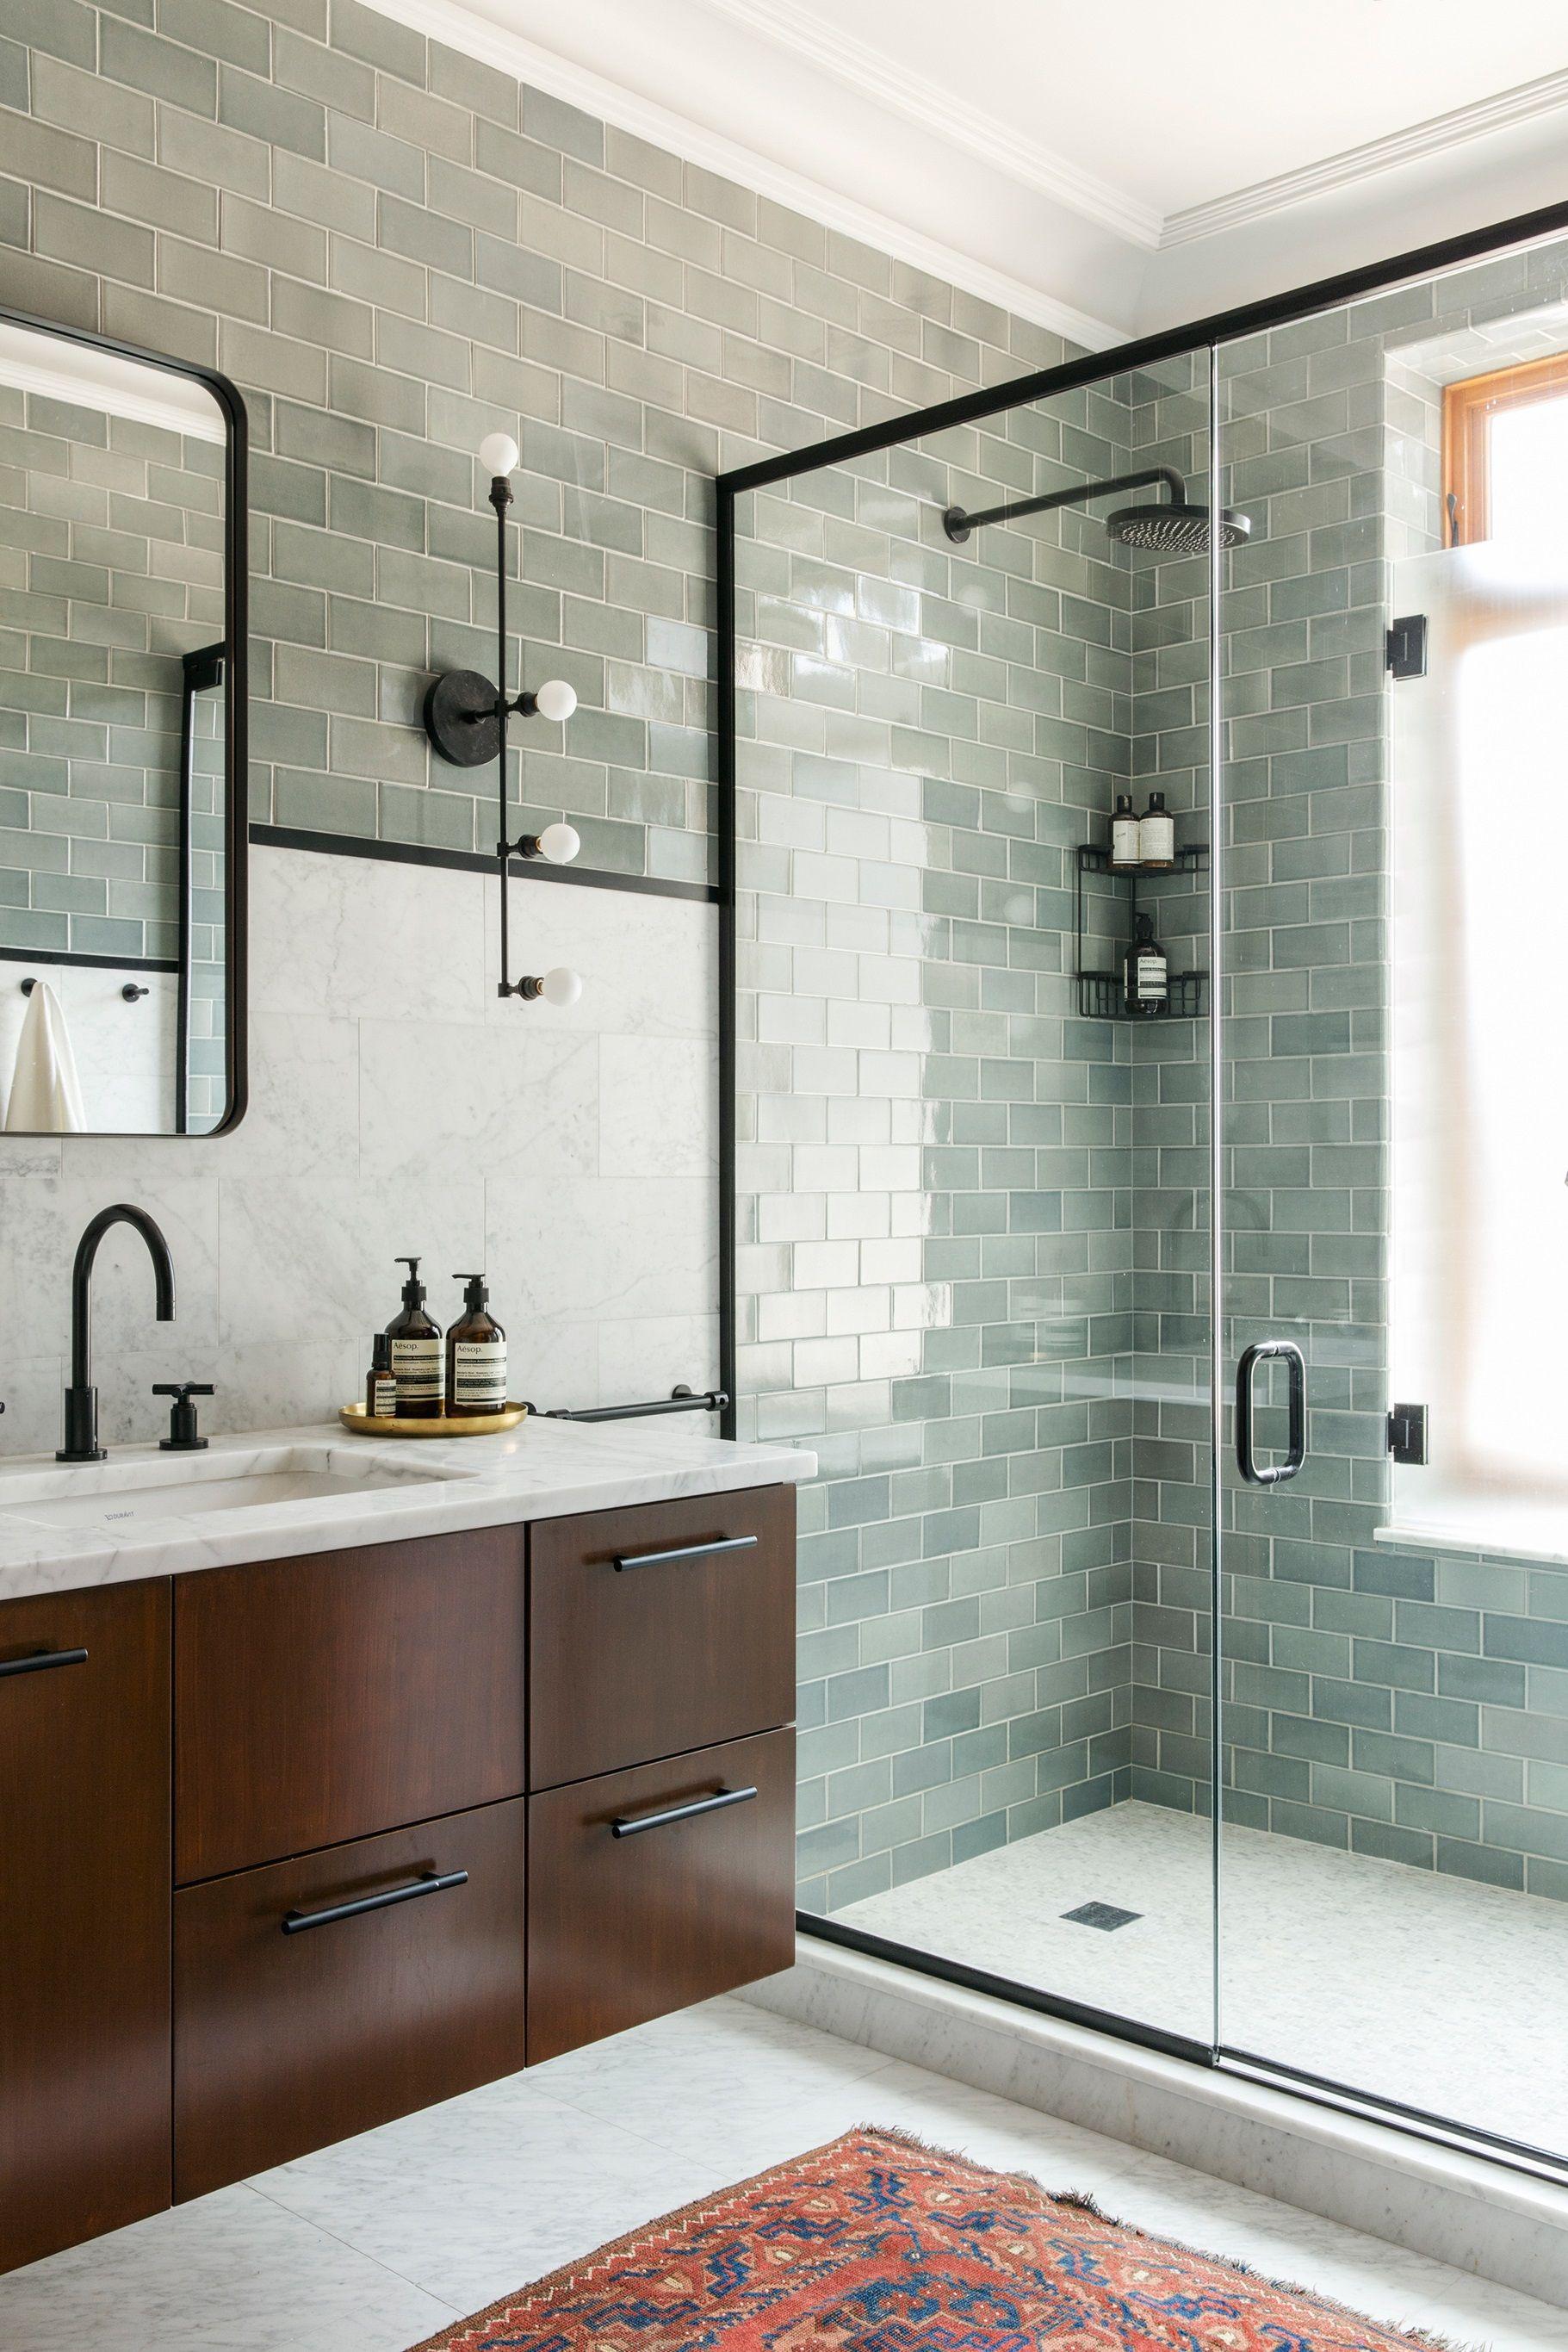 szarozielone płytki ścienne typu metro | bathrooms | Pinterest ...